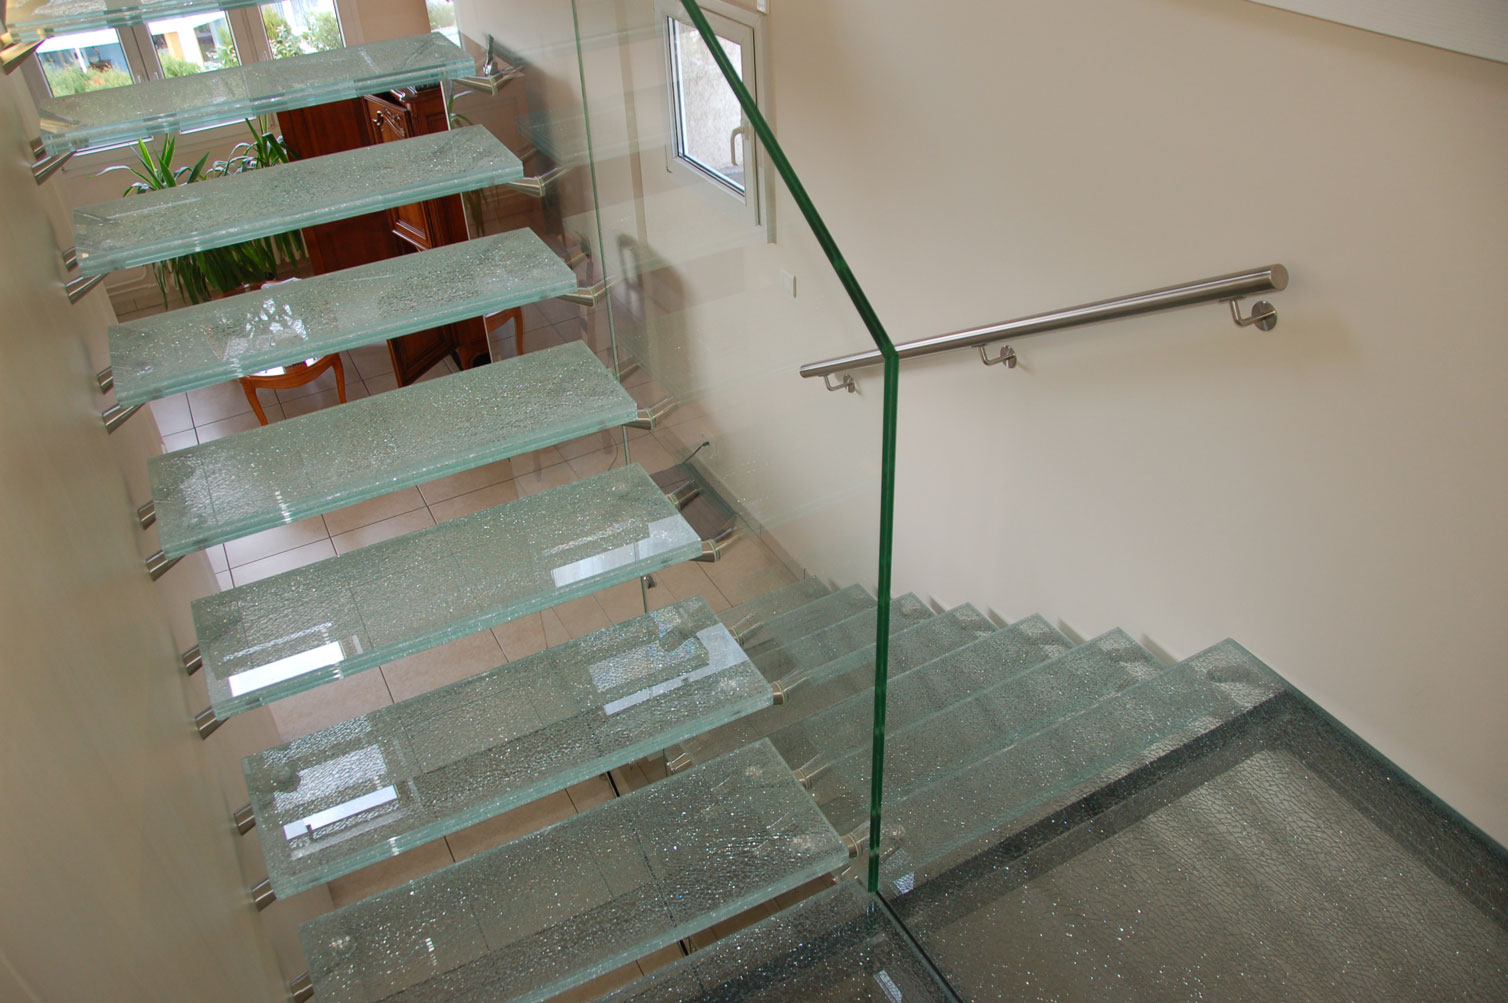 am nagement int rieur marches d escaliers siala. Black Bedroom Furniture Sets. Home Design Ideas